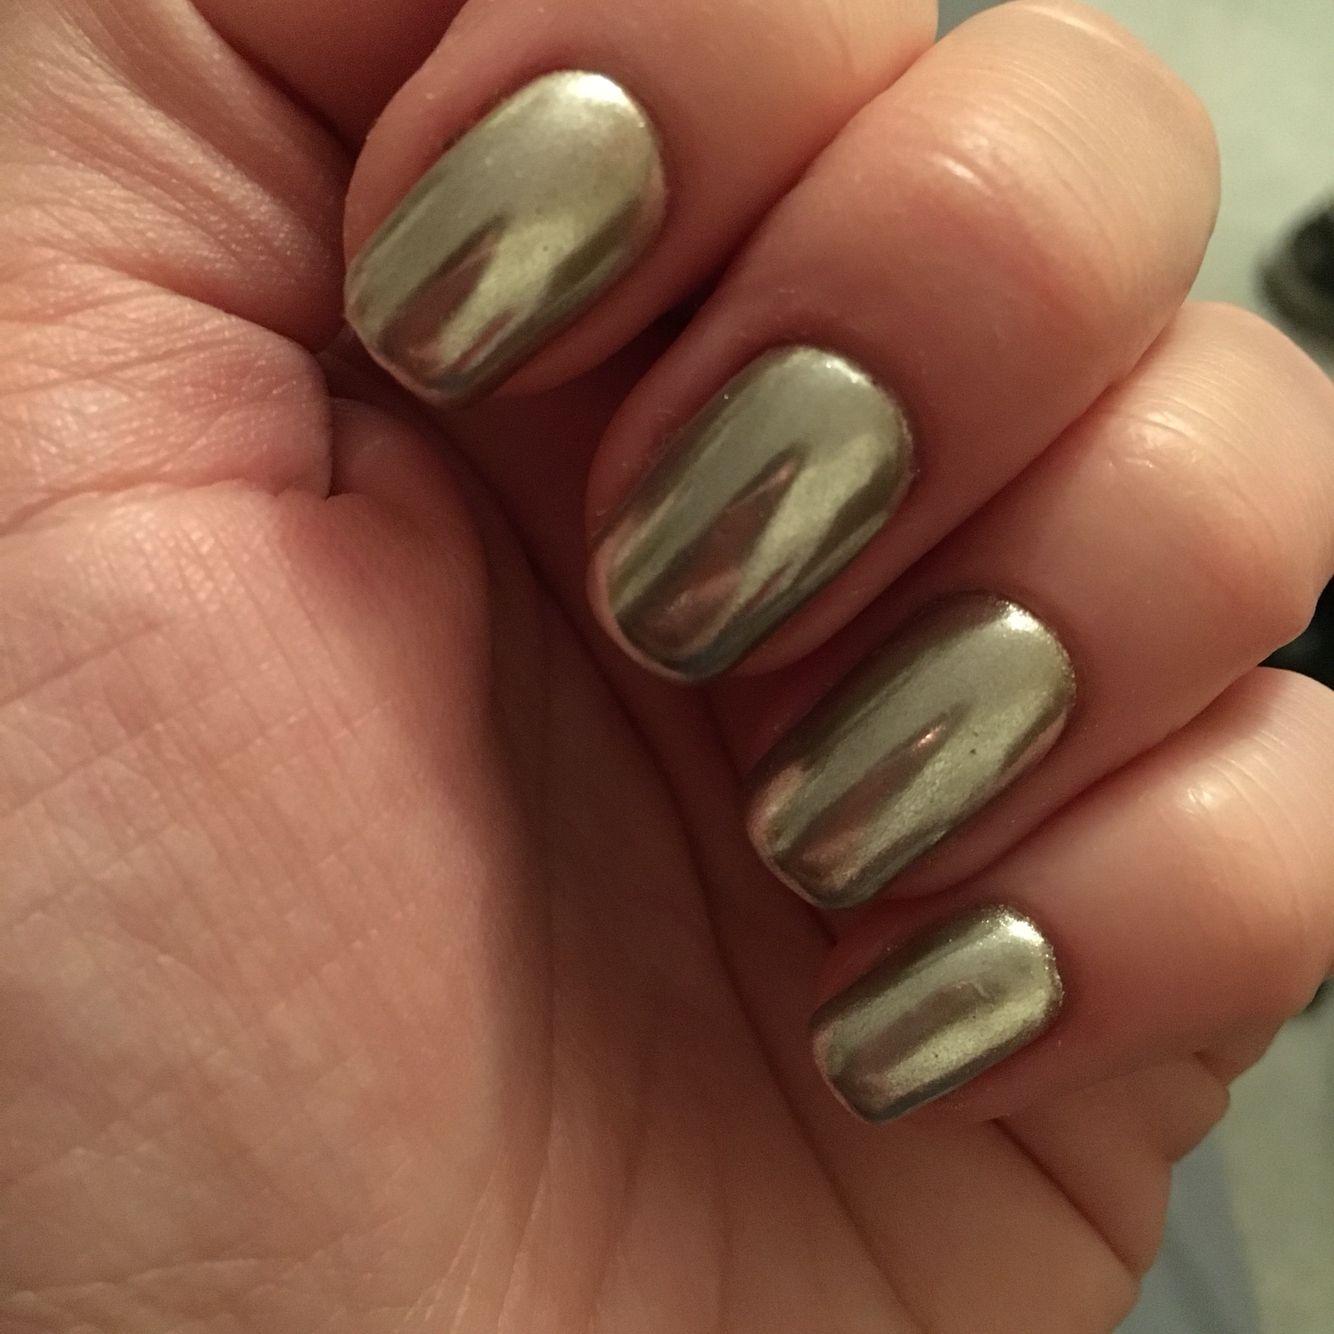 Chrome powder nails using bio sculpture. Metallic silver look ...